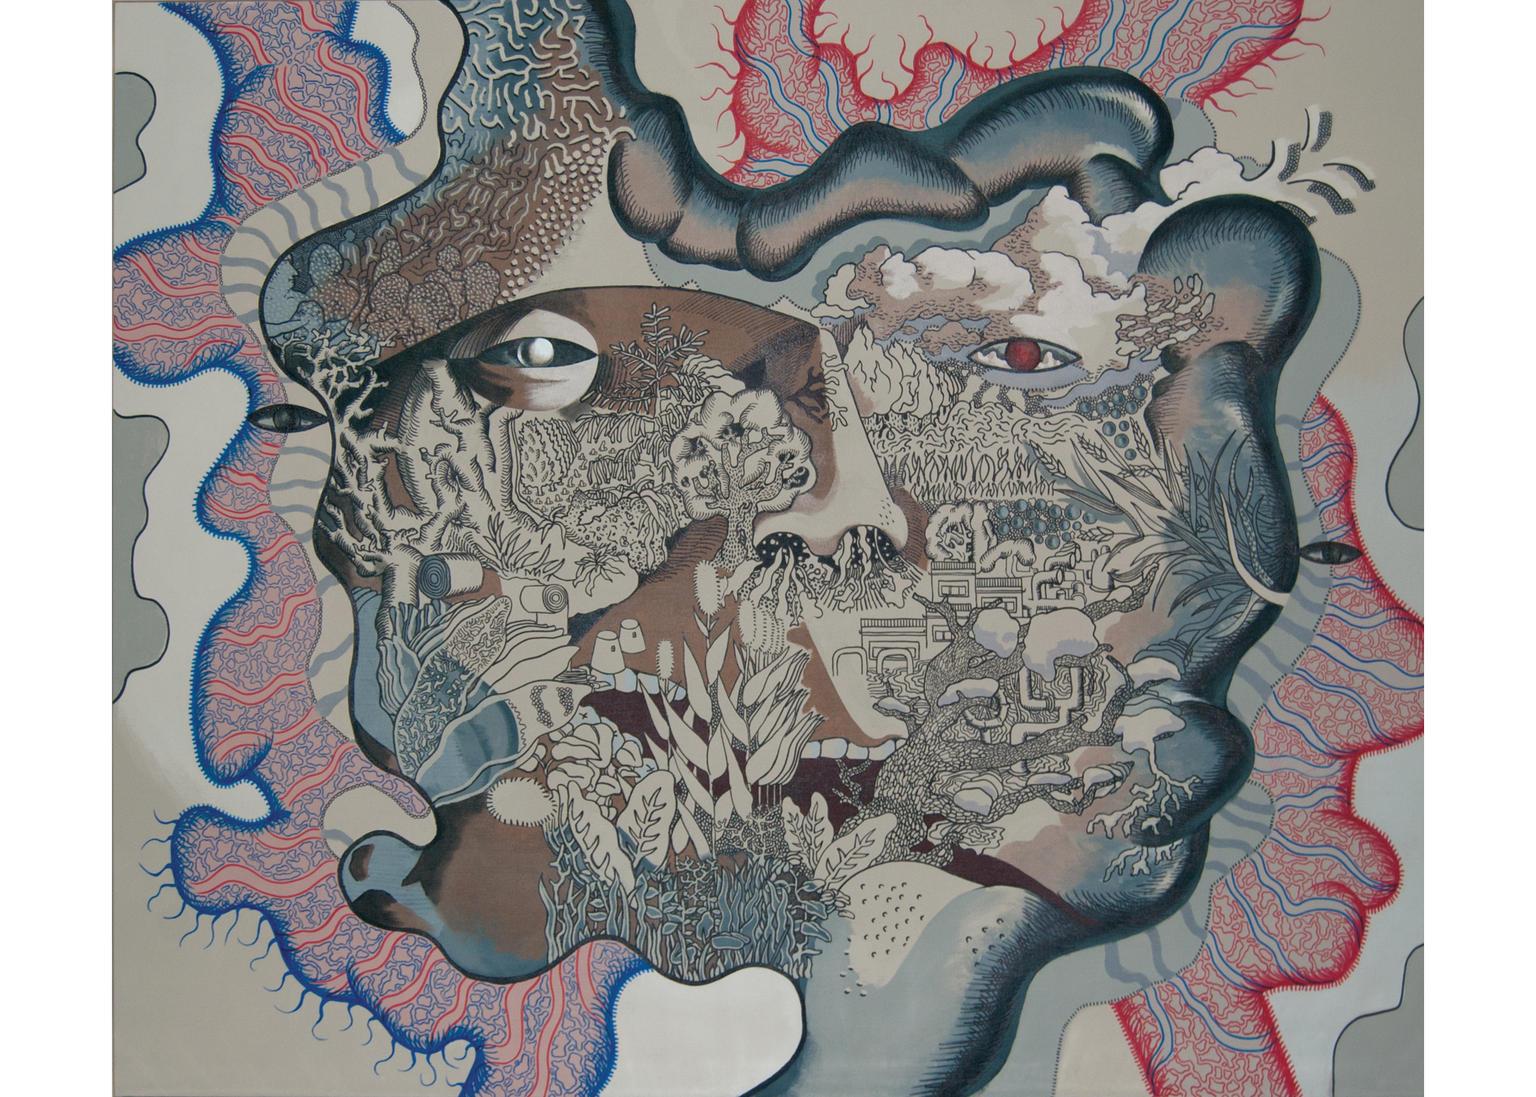 https://ytph.fr/sites/default/files/styles/work_full_size/public/images/Oeuvres/Peinture_2012/Substance.jpg?itok=9dJOT6TN